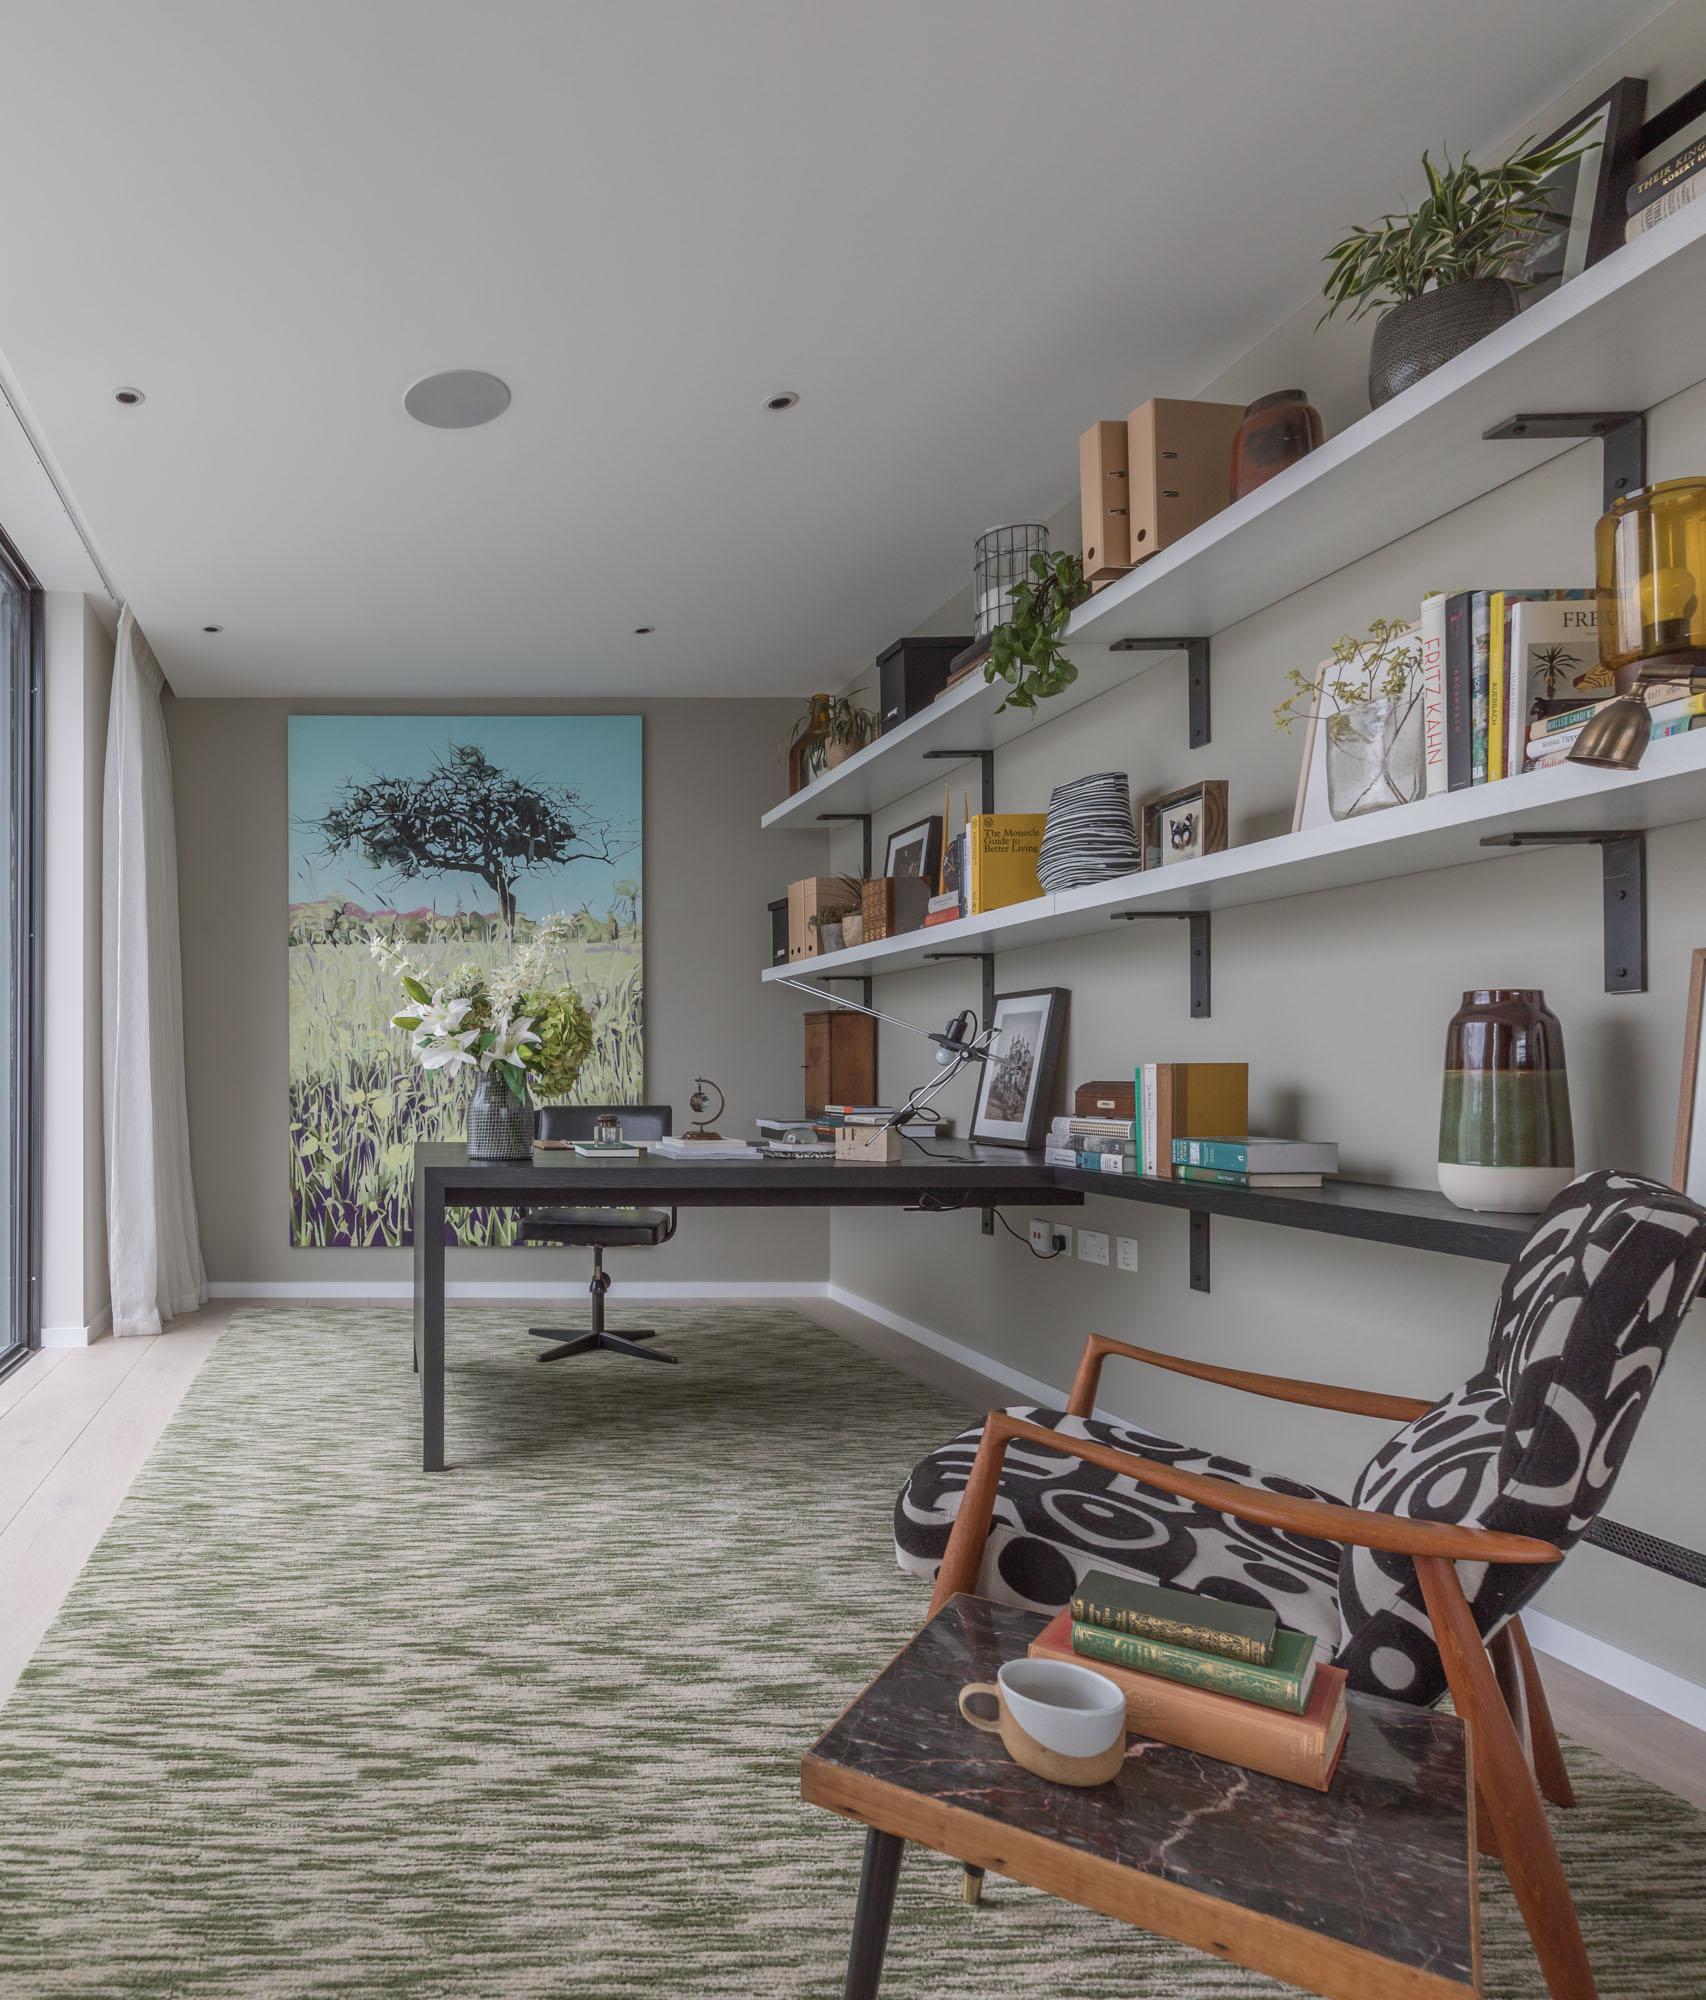 jonathan bond, interior photographer, study room, battersea, london